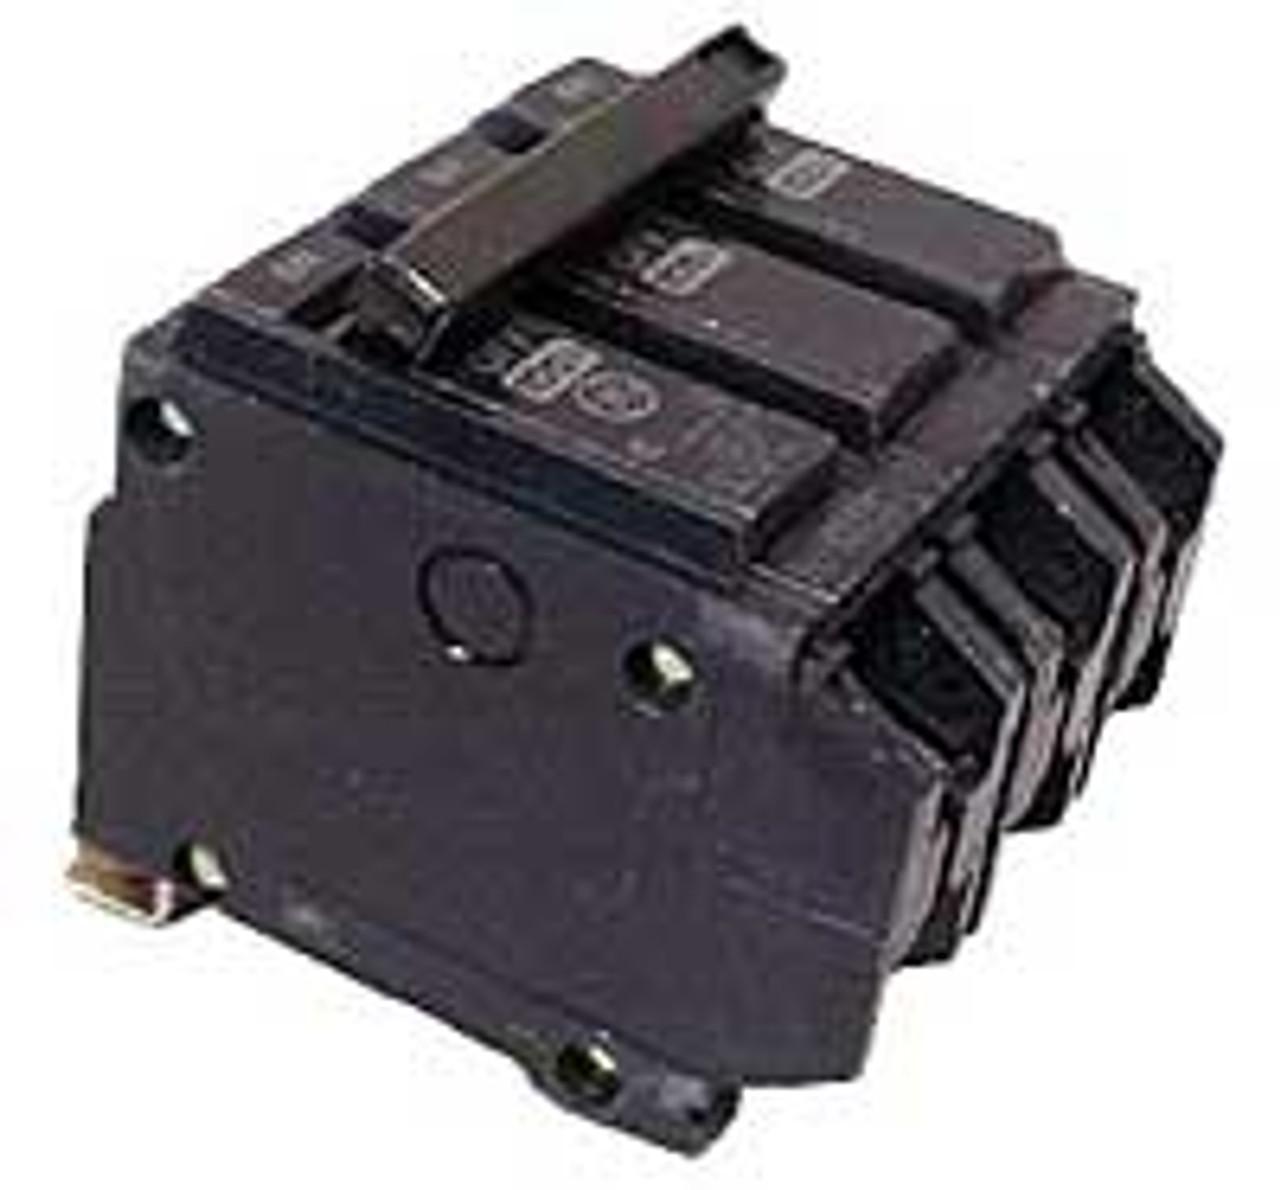 General Electric THQB32020ST1 3P 20A 240V Shunt Circuit Breaker - New